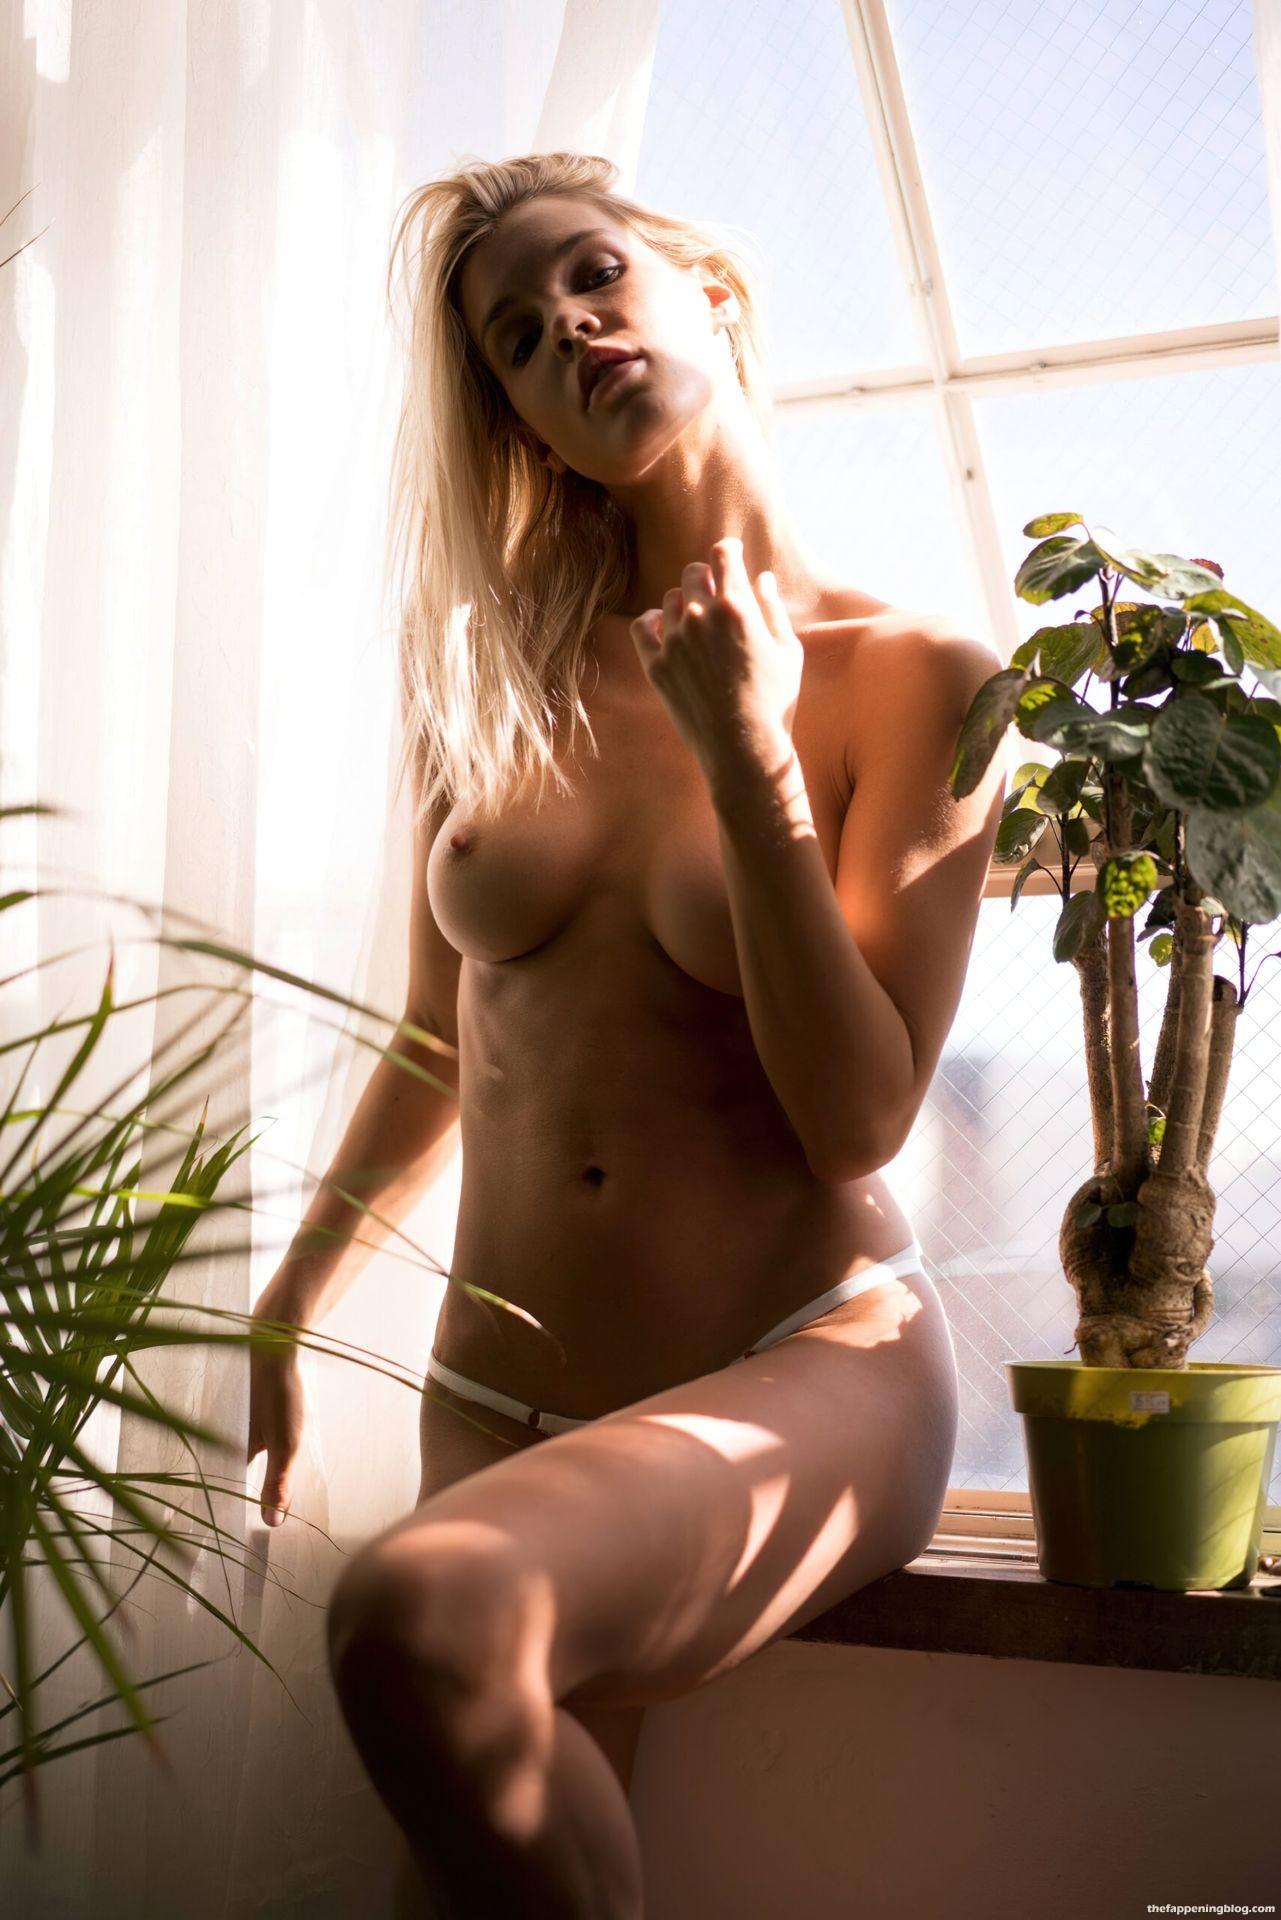 Joy-Corrigan-Naked-Tits-and-Ass-12-scaled1-thefappeningblog.com_.jpg